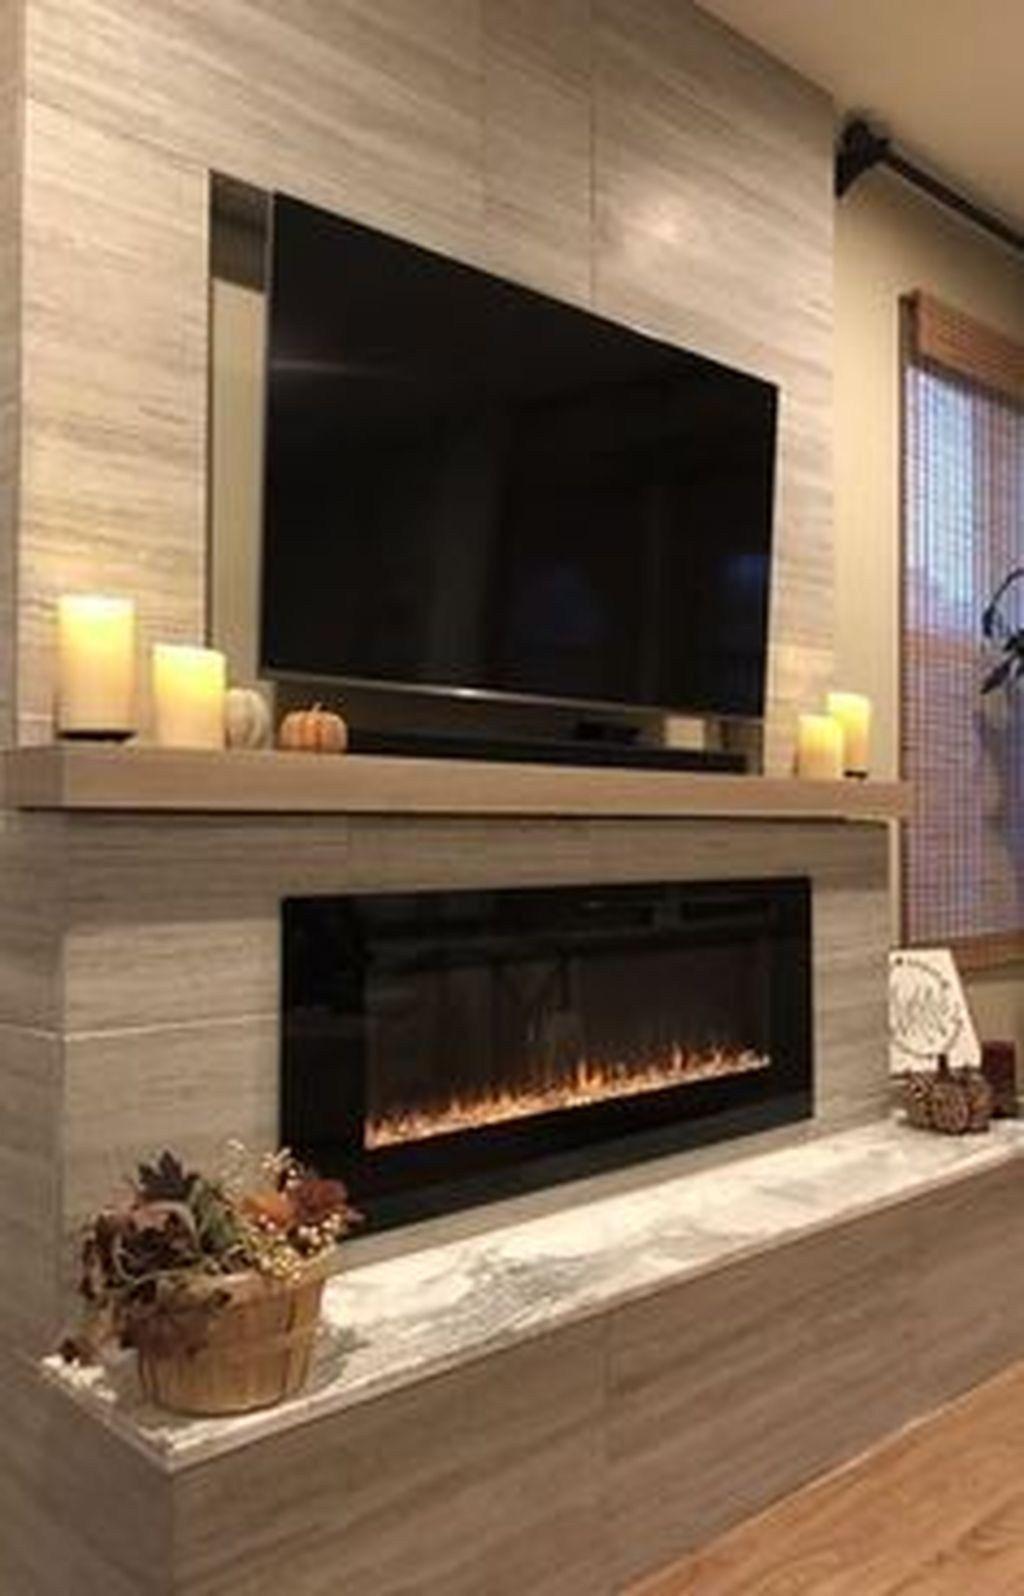 Popular Fireplace Design Ideas 30 Fireplace Outdoorfireplace